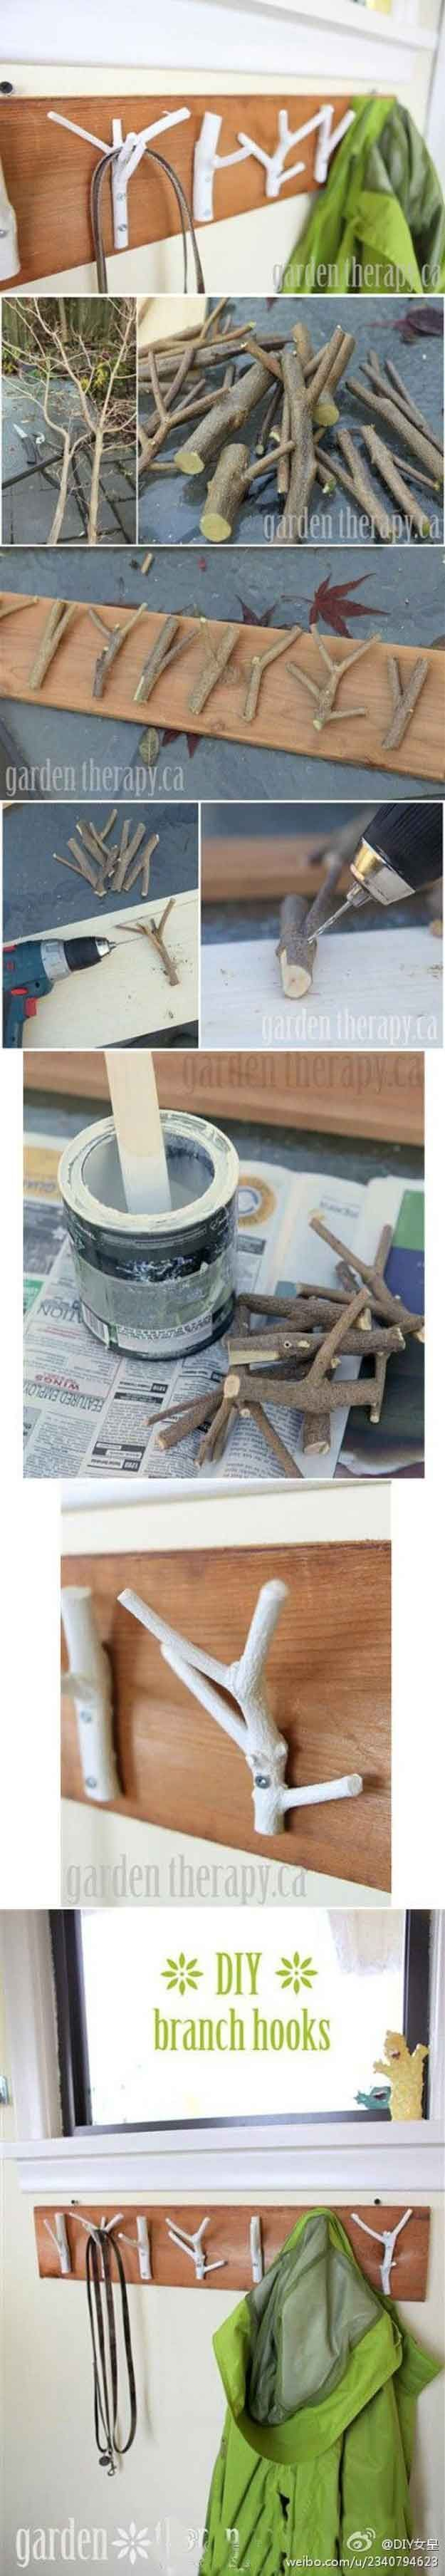 Straightforward DIY Teen Room Decor Concepts for Boys DIYReady.com | Straightforward DIY Crafts, Enjoyable Tasks, & DIY Craft Concepts For Youngsters & Adults.  See more at the photo